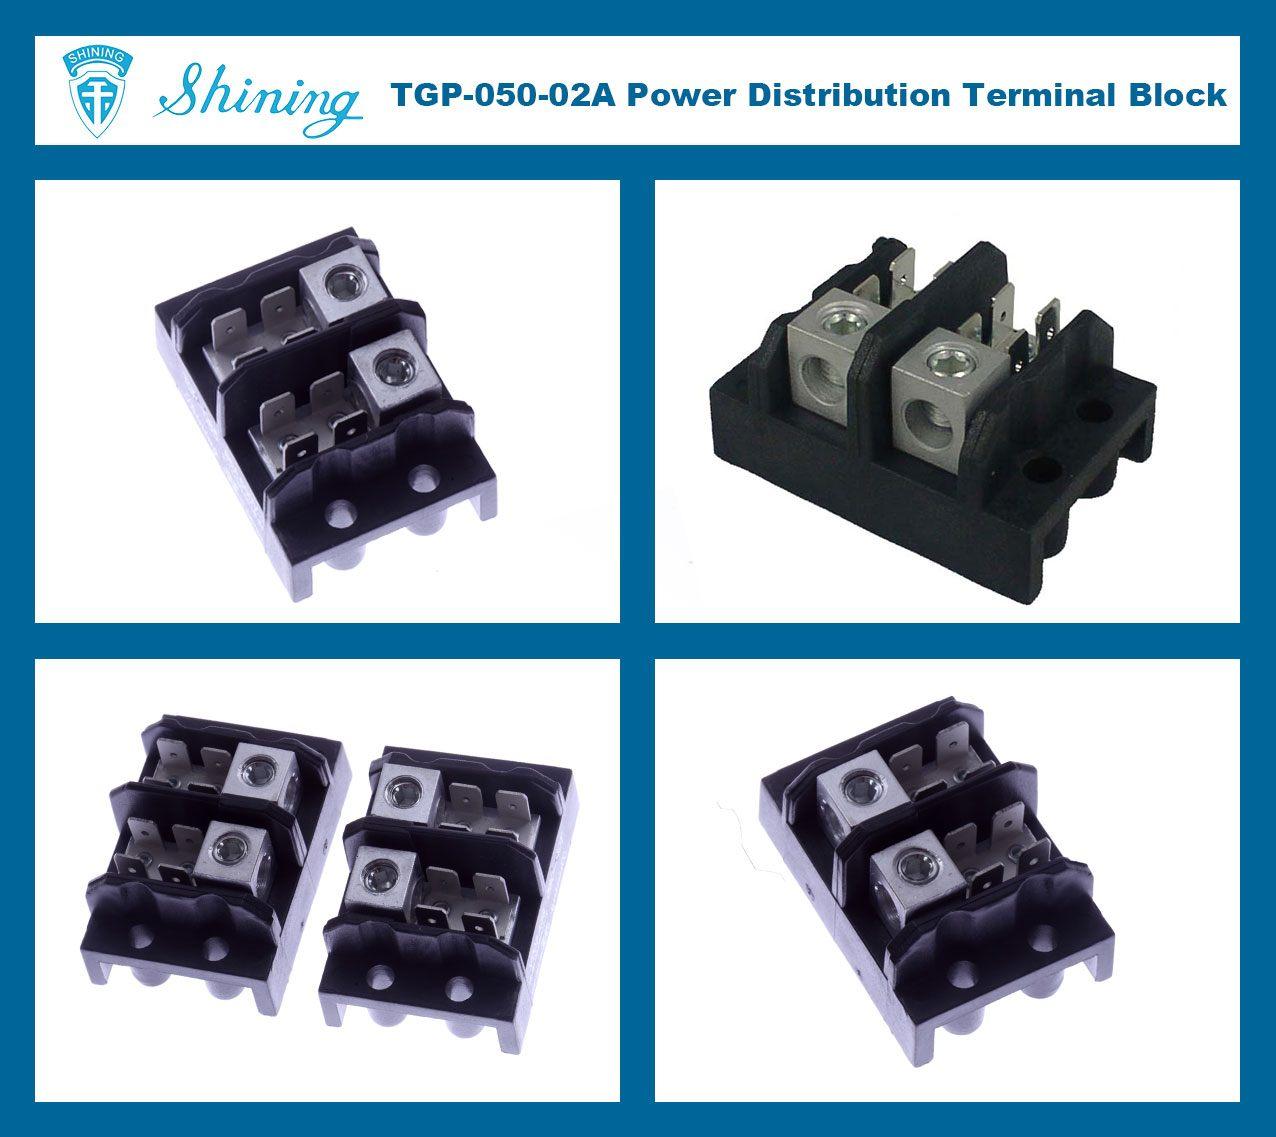 TGP-050-02A 600V 50A 2 Pole Electrical Power Terminal Block